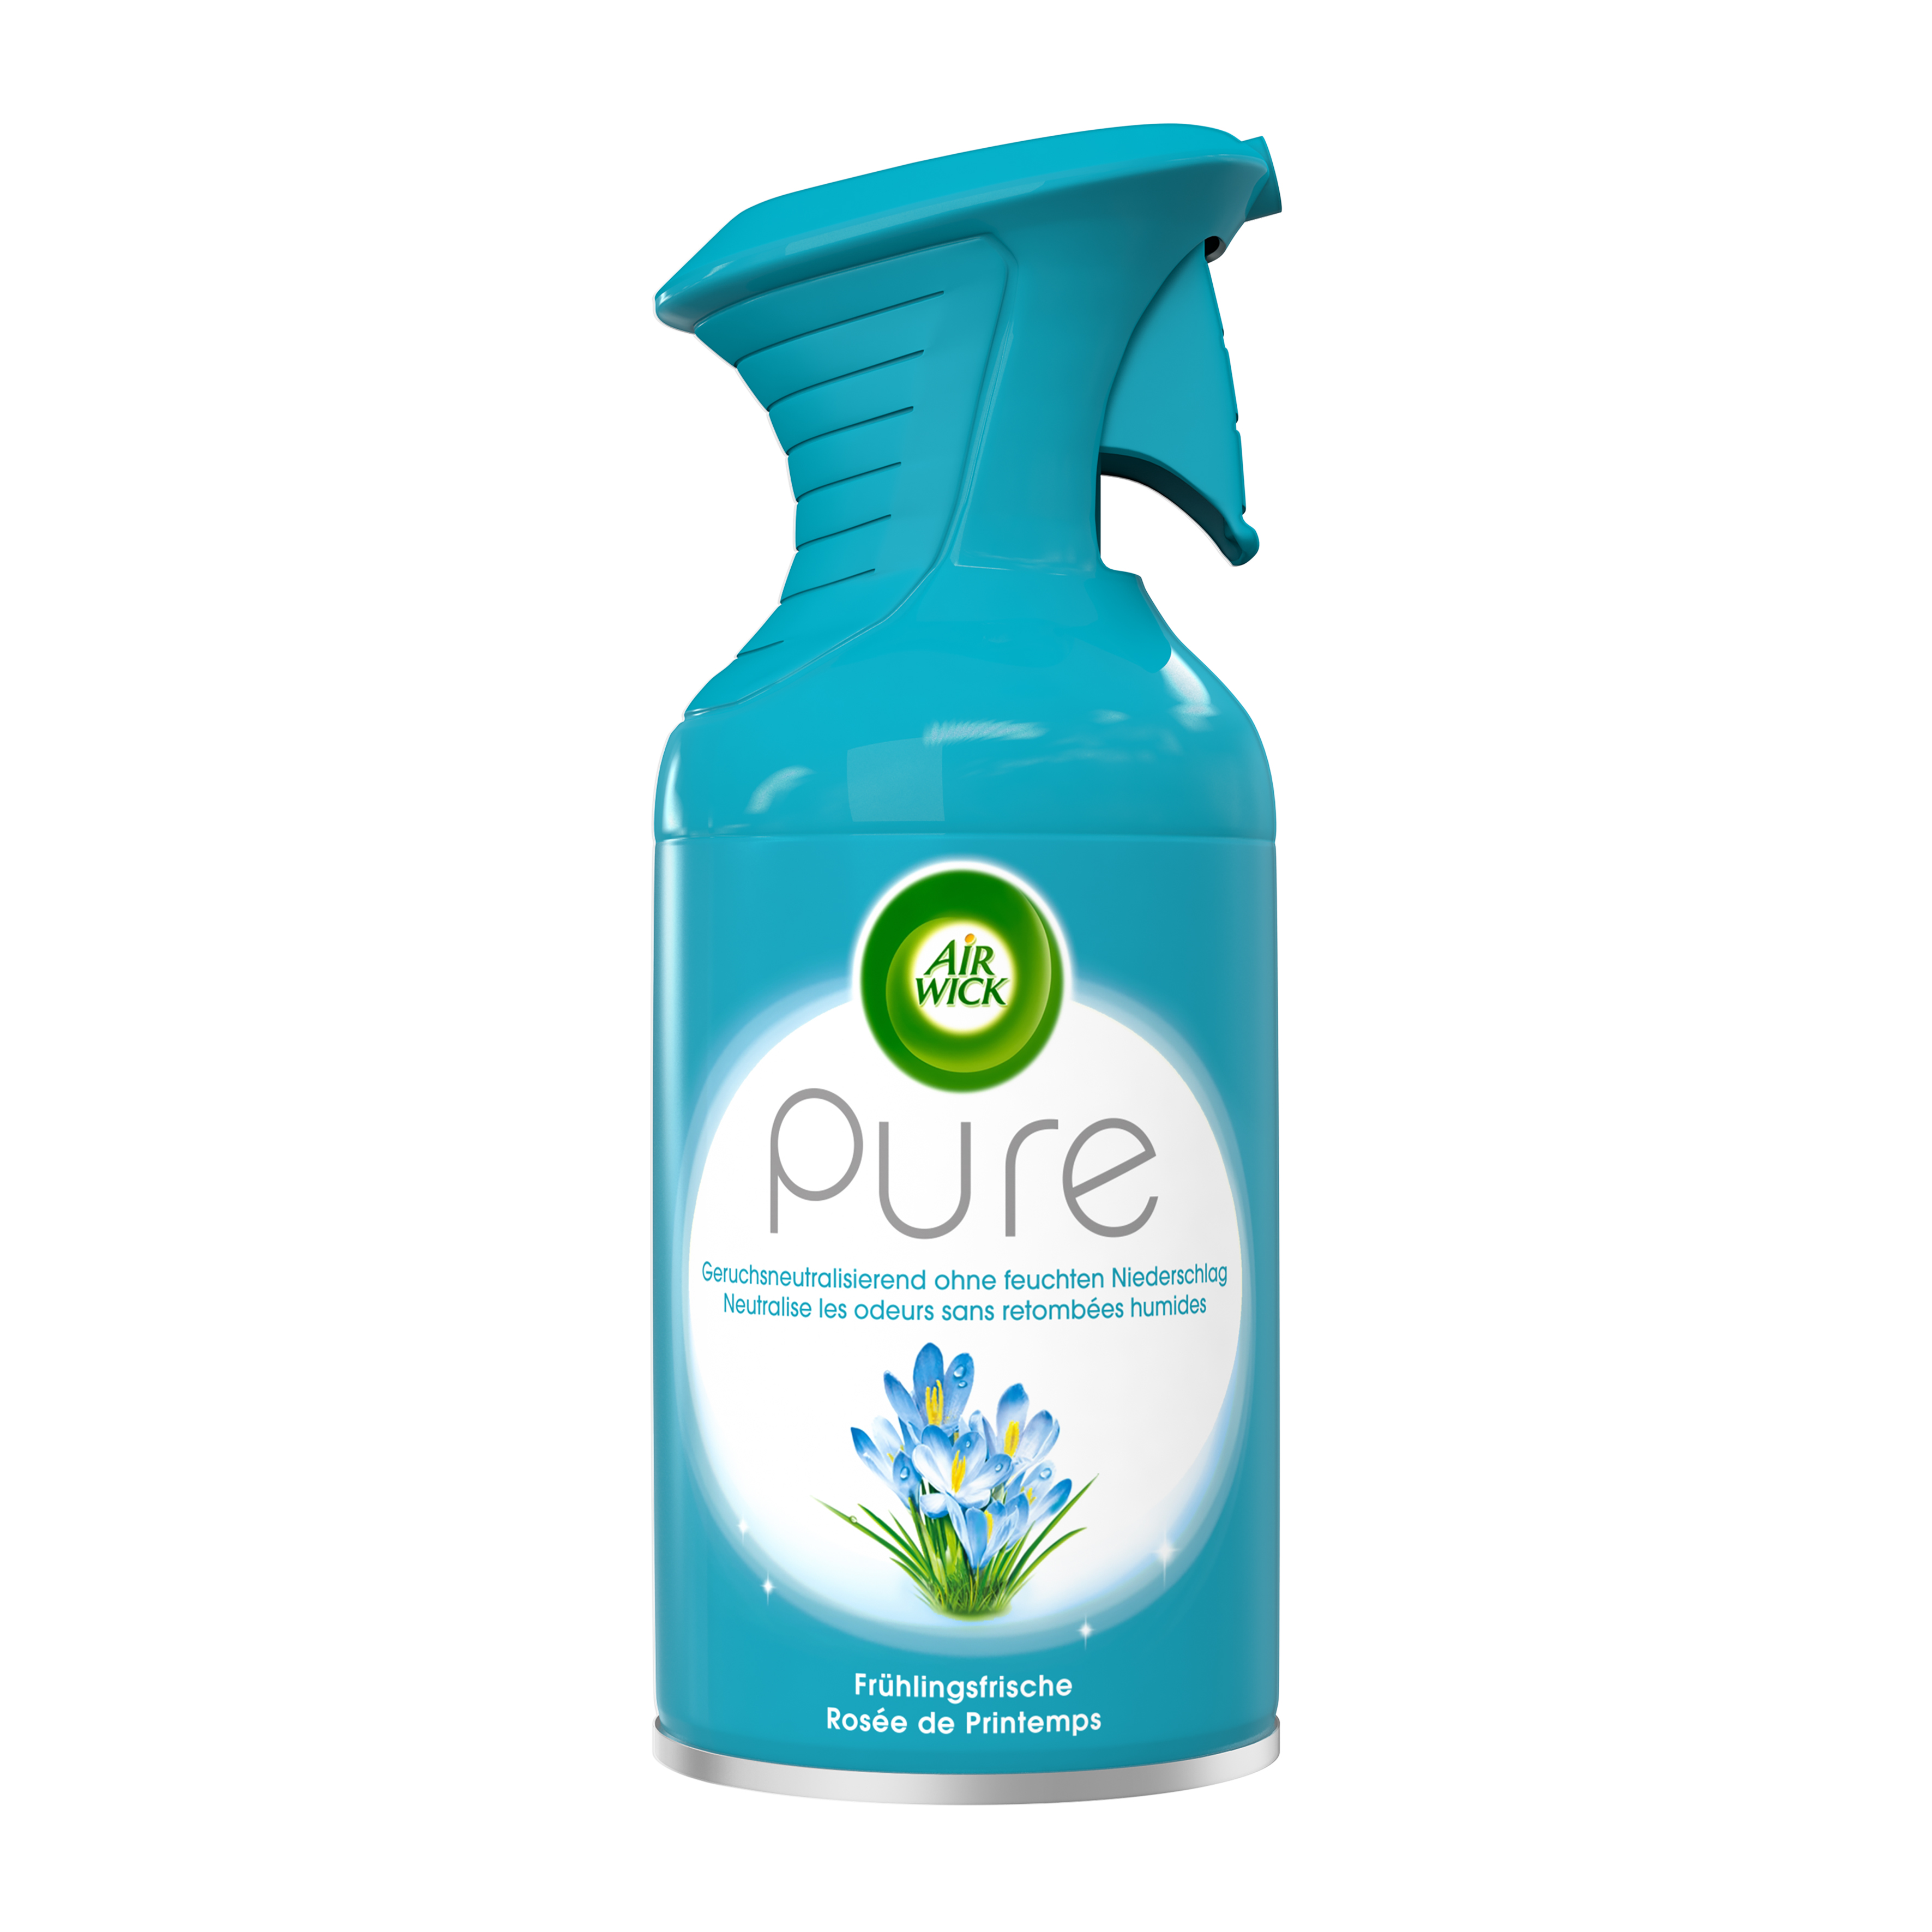 Air Wick Premium-Duftspray PURE Frühlingsfrische